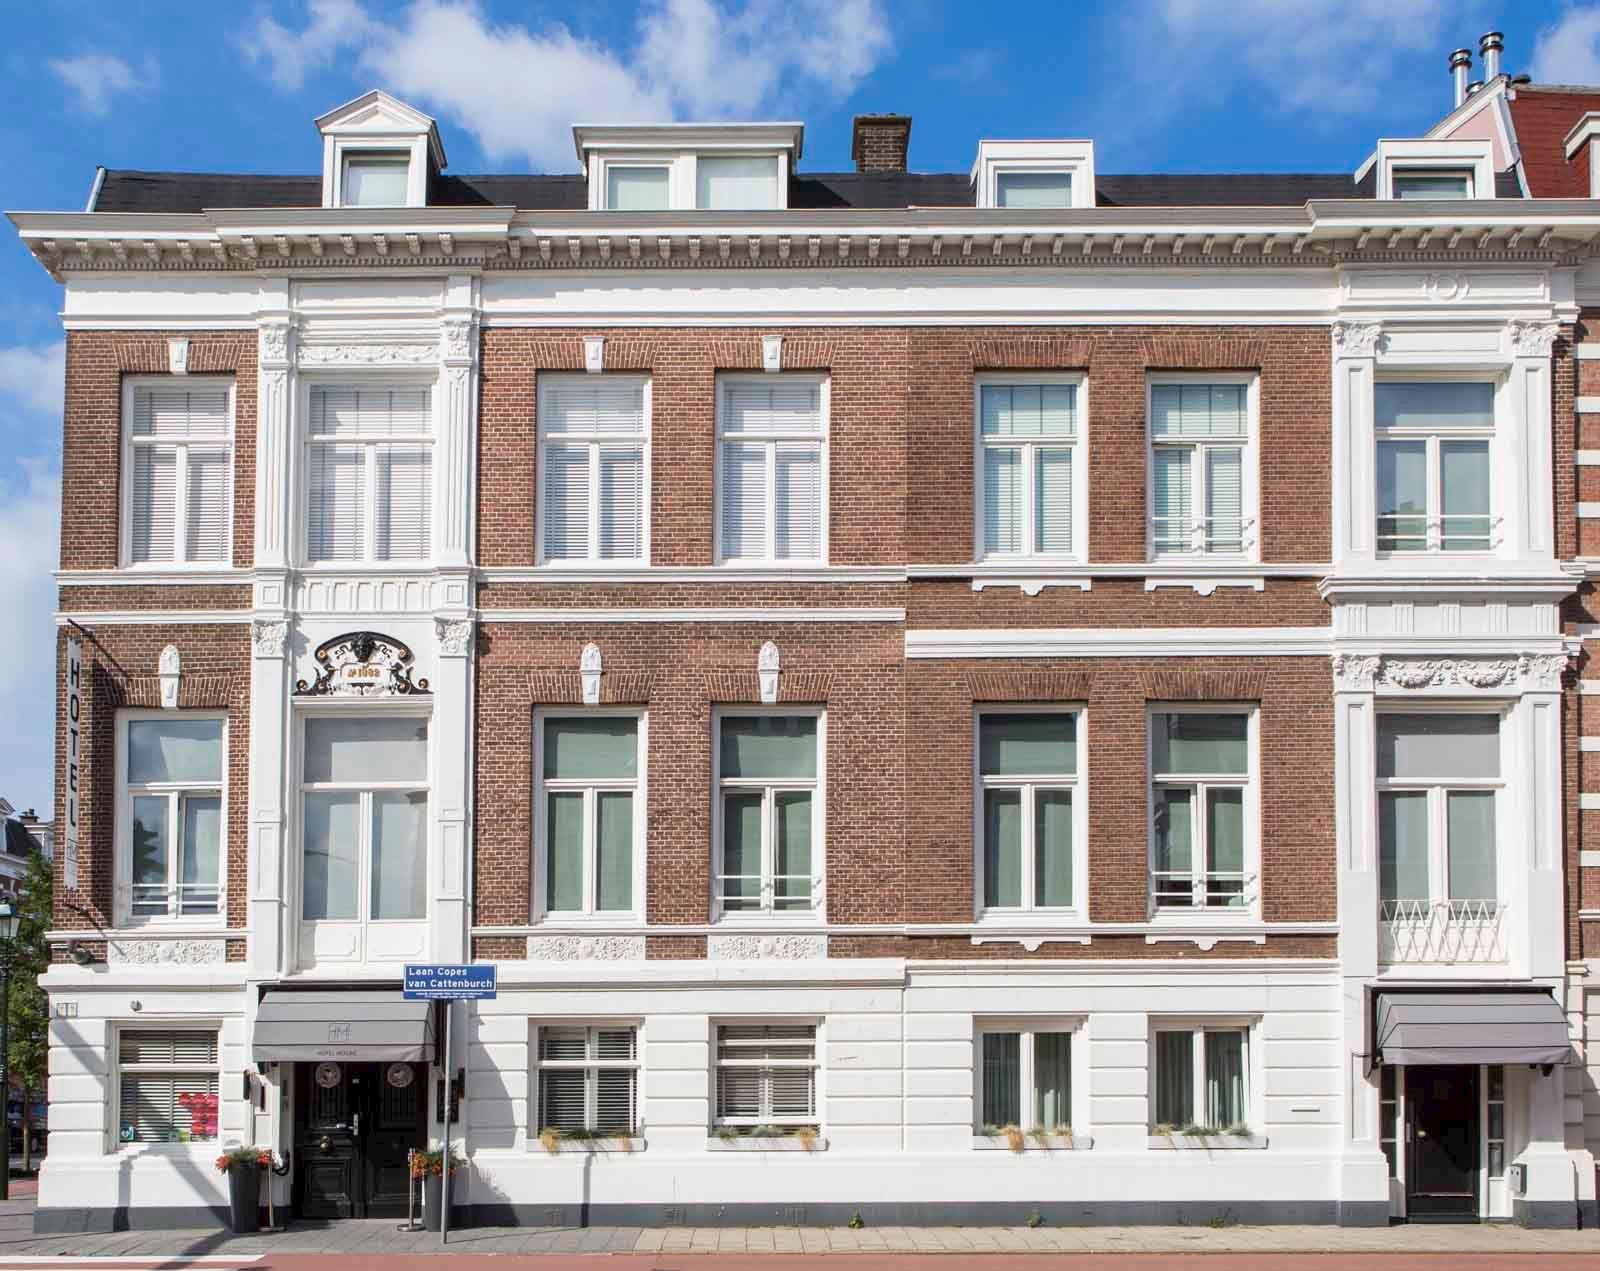 Review Mosaic Hotel Stadsvilla Mozaic Den Haag The Hague Tripadvisor